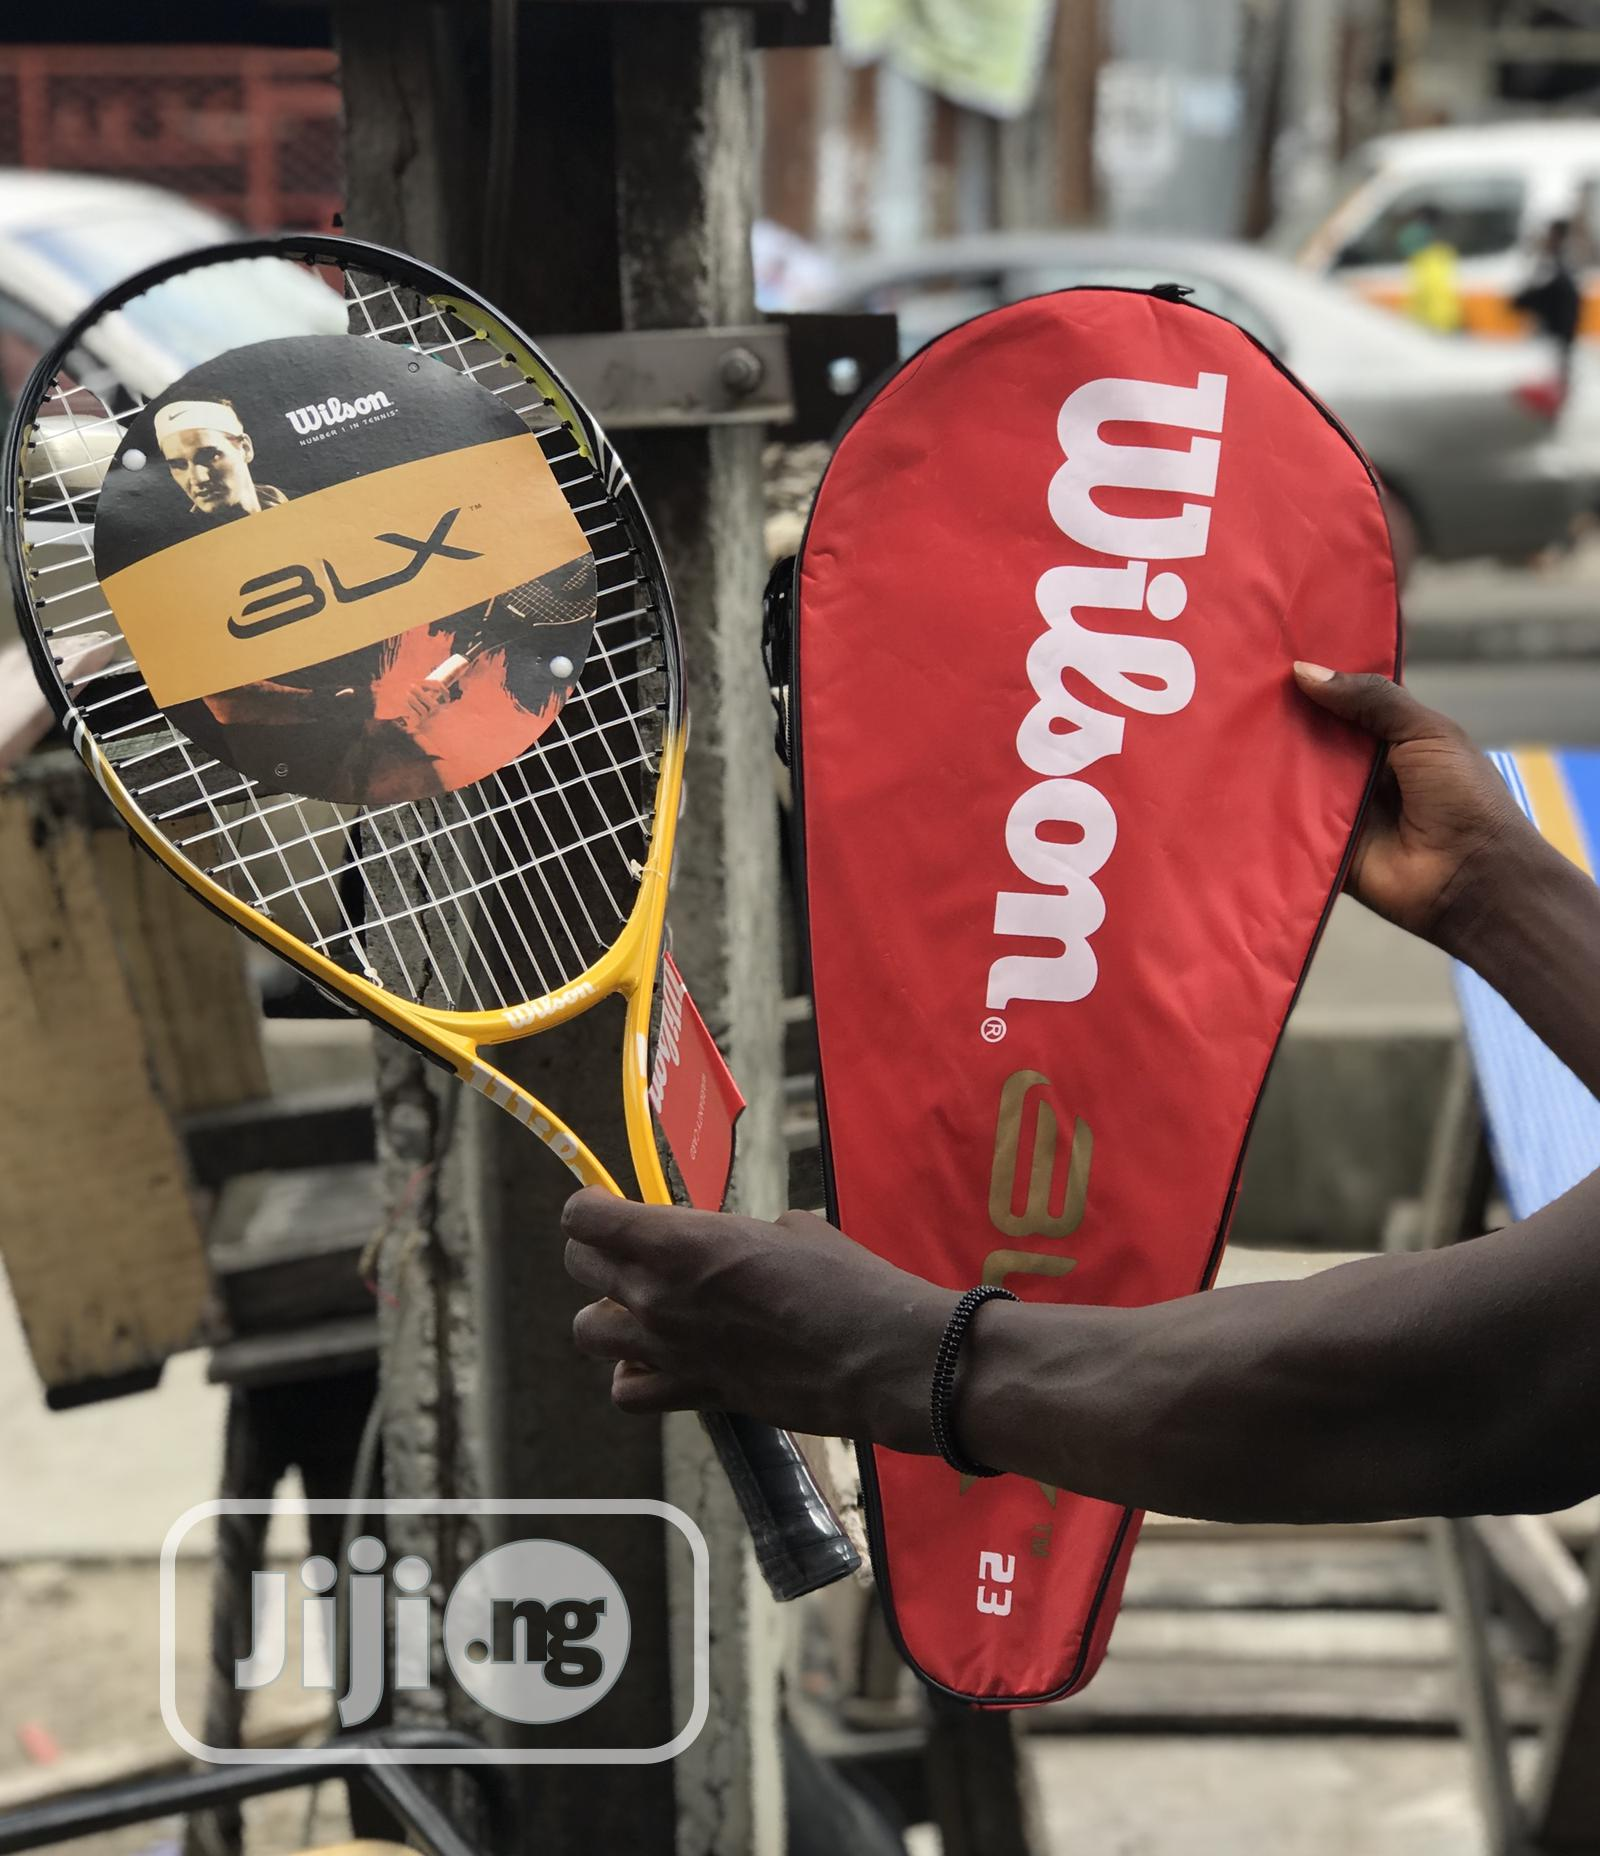 Wilson BLX Lawn Tennis Racket